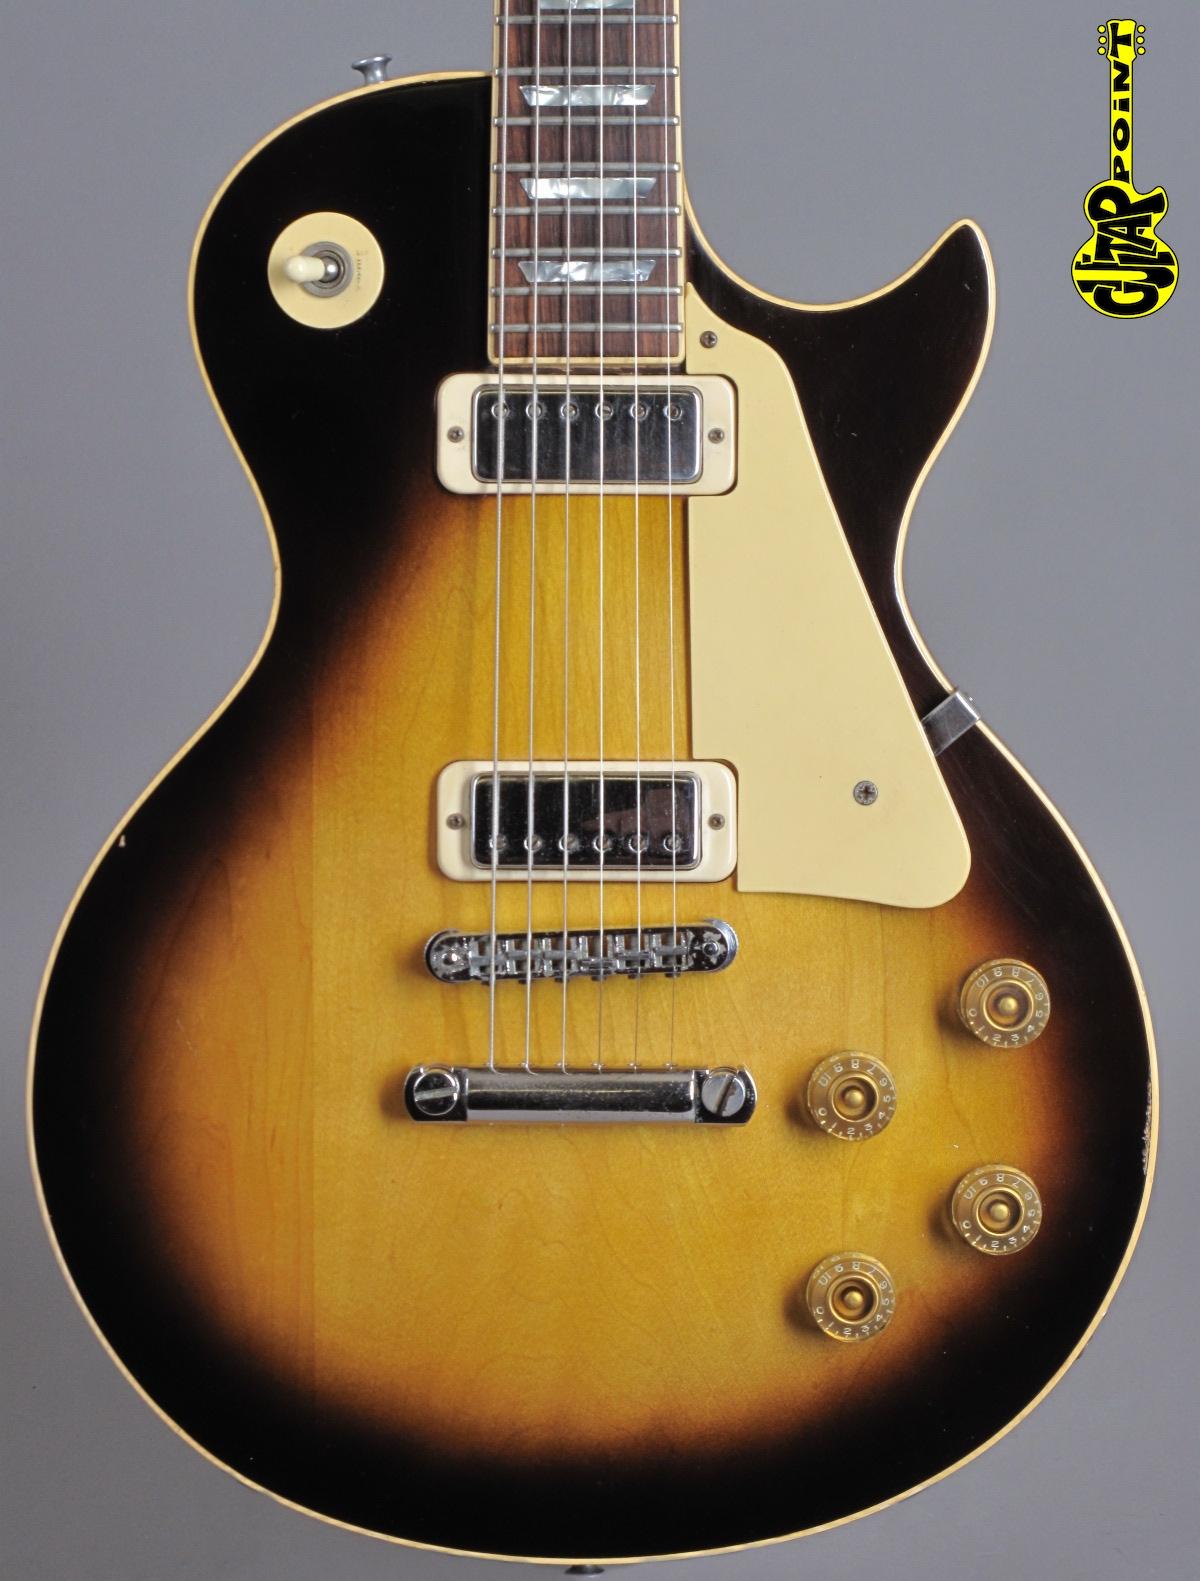 1980 Gibson Les Paul Deluxe - Tobacco Sunburst